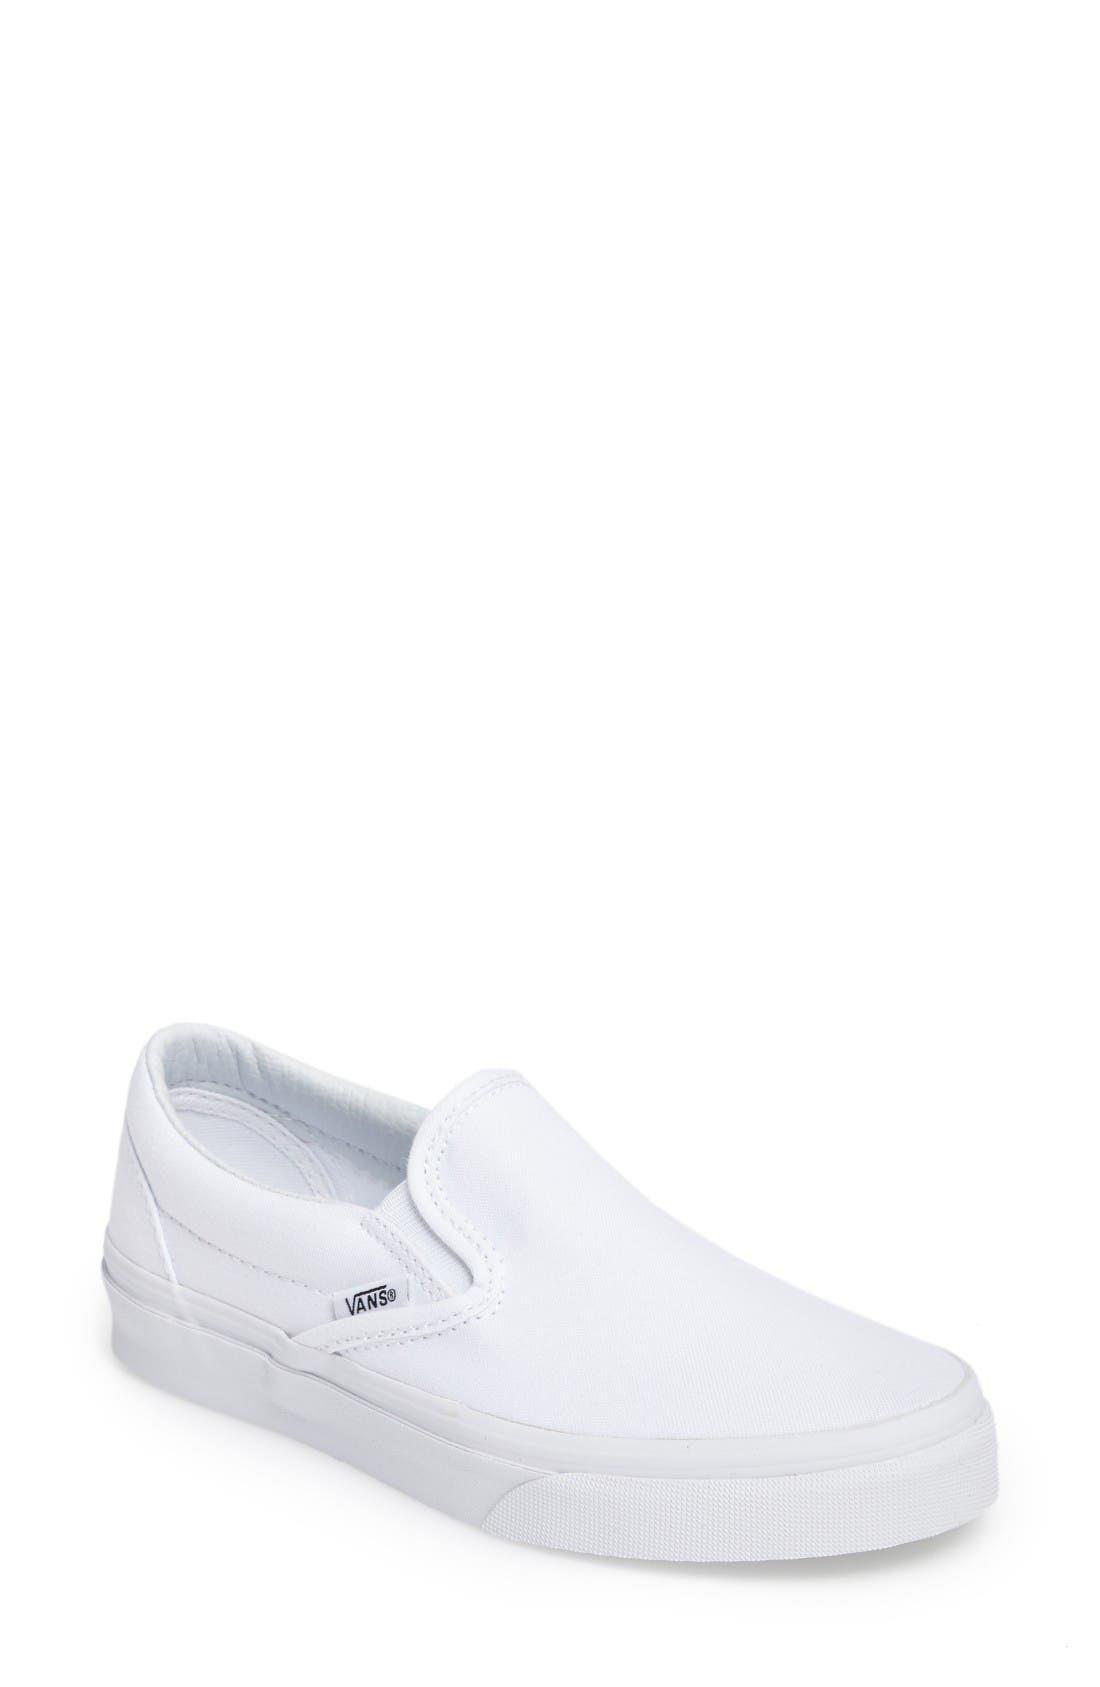 womens white vans pumps